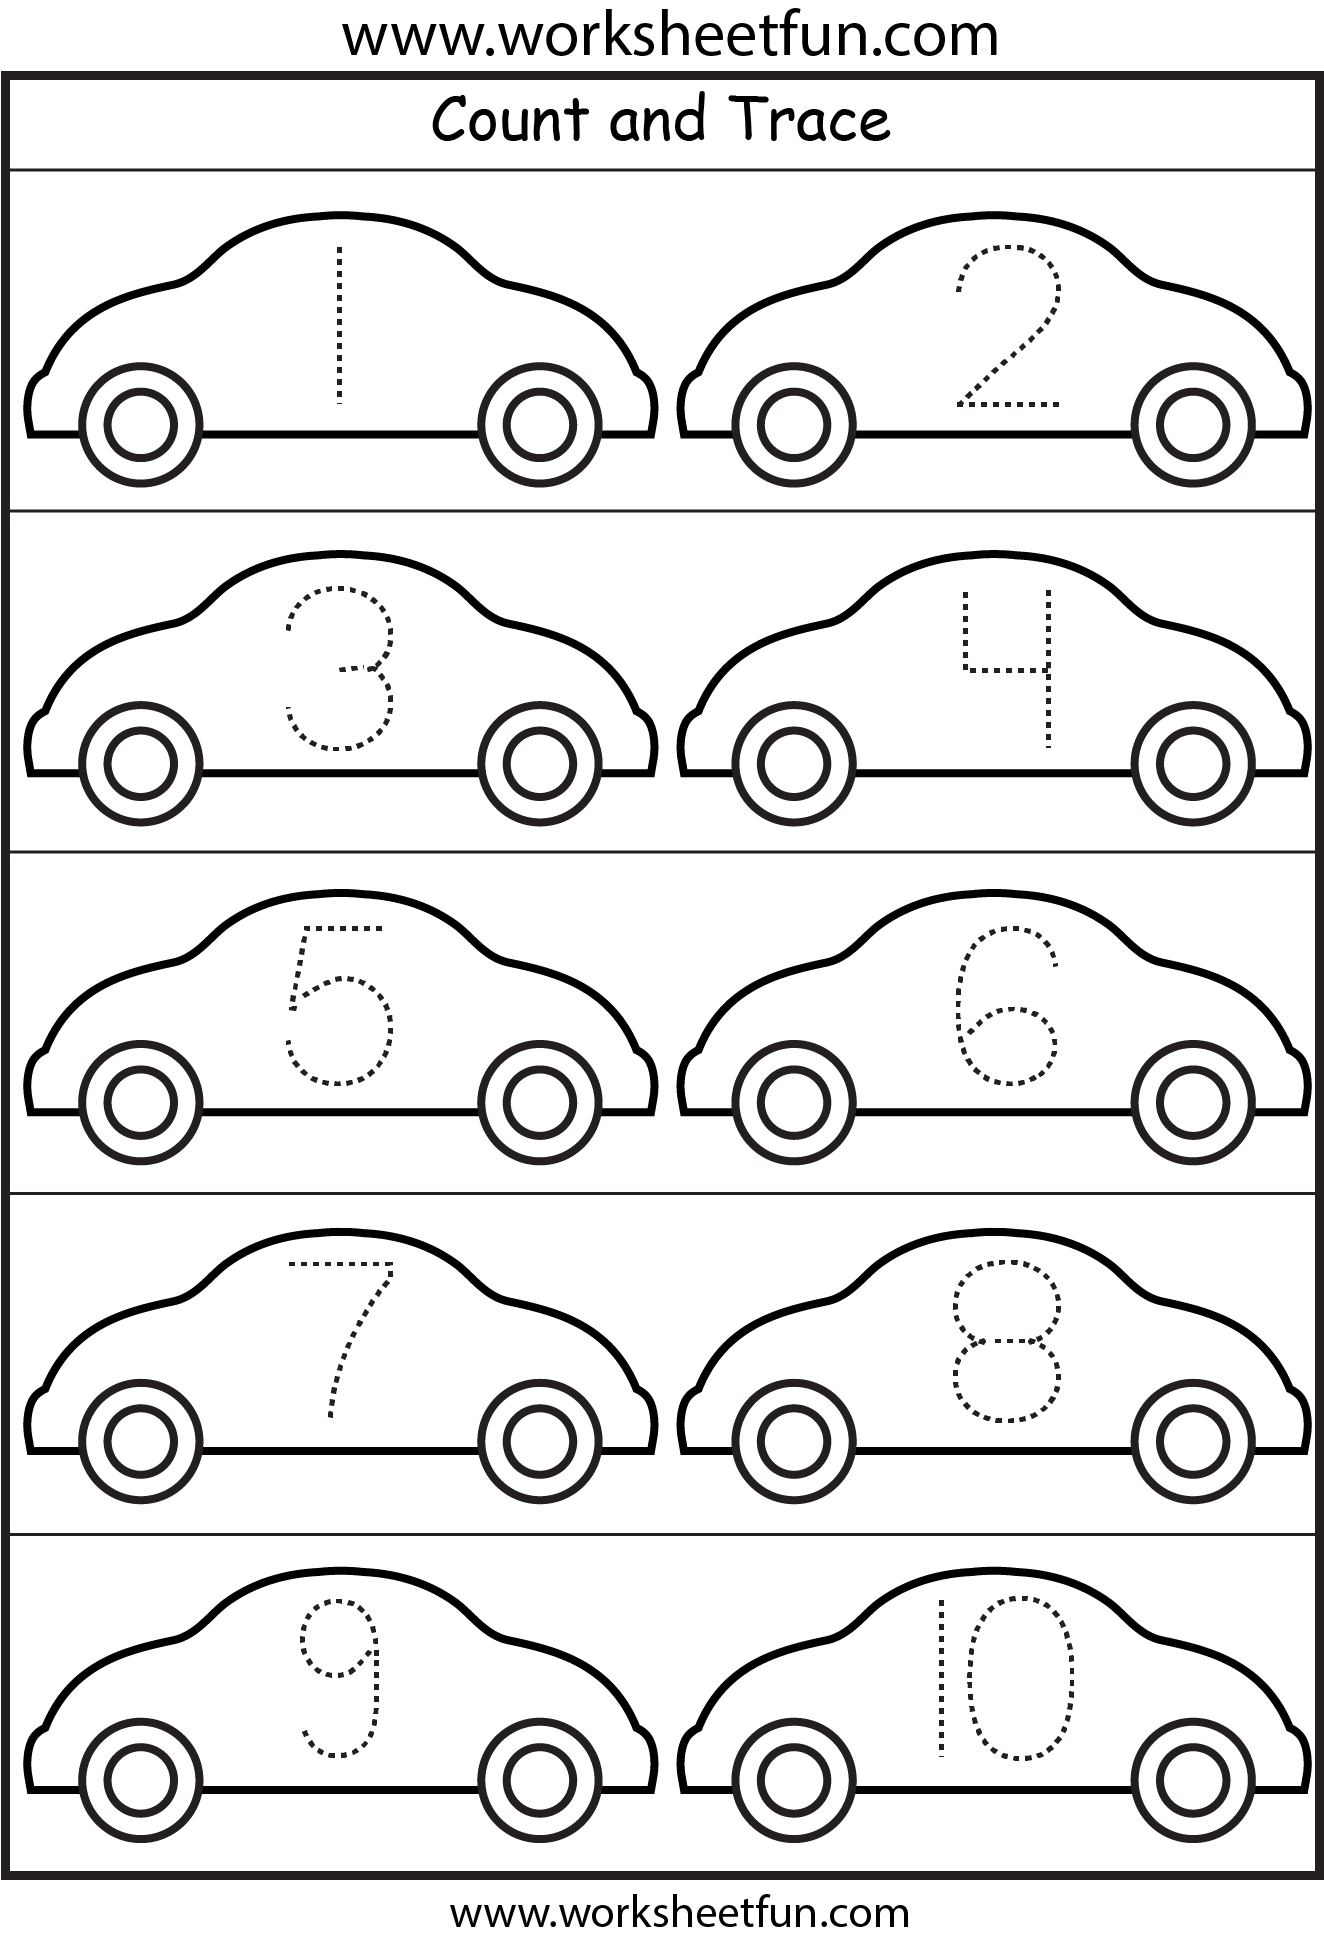 Number Tracing 1 Worksheet Transportation Theme Preschool Transportation Preschool Tracing Worksheets Preschool [ 1939 x 1324 Pixel ]